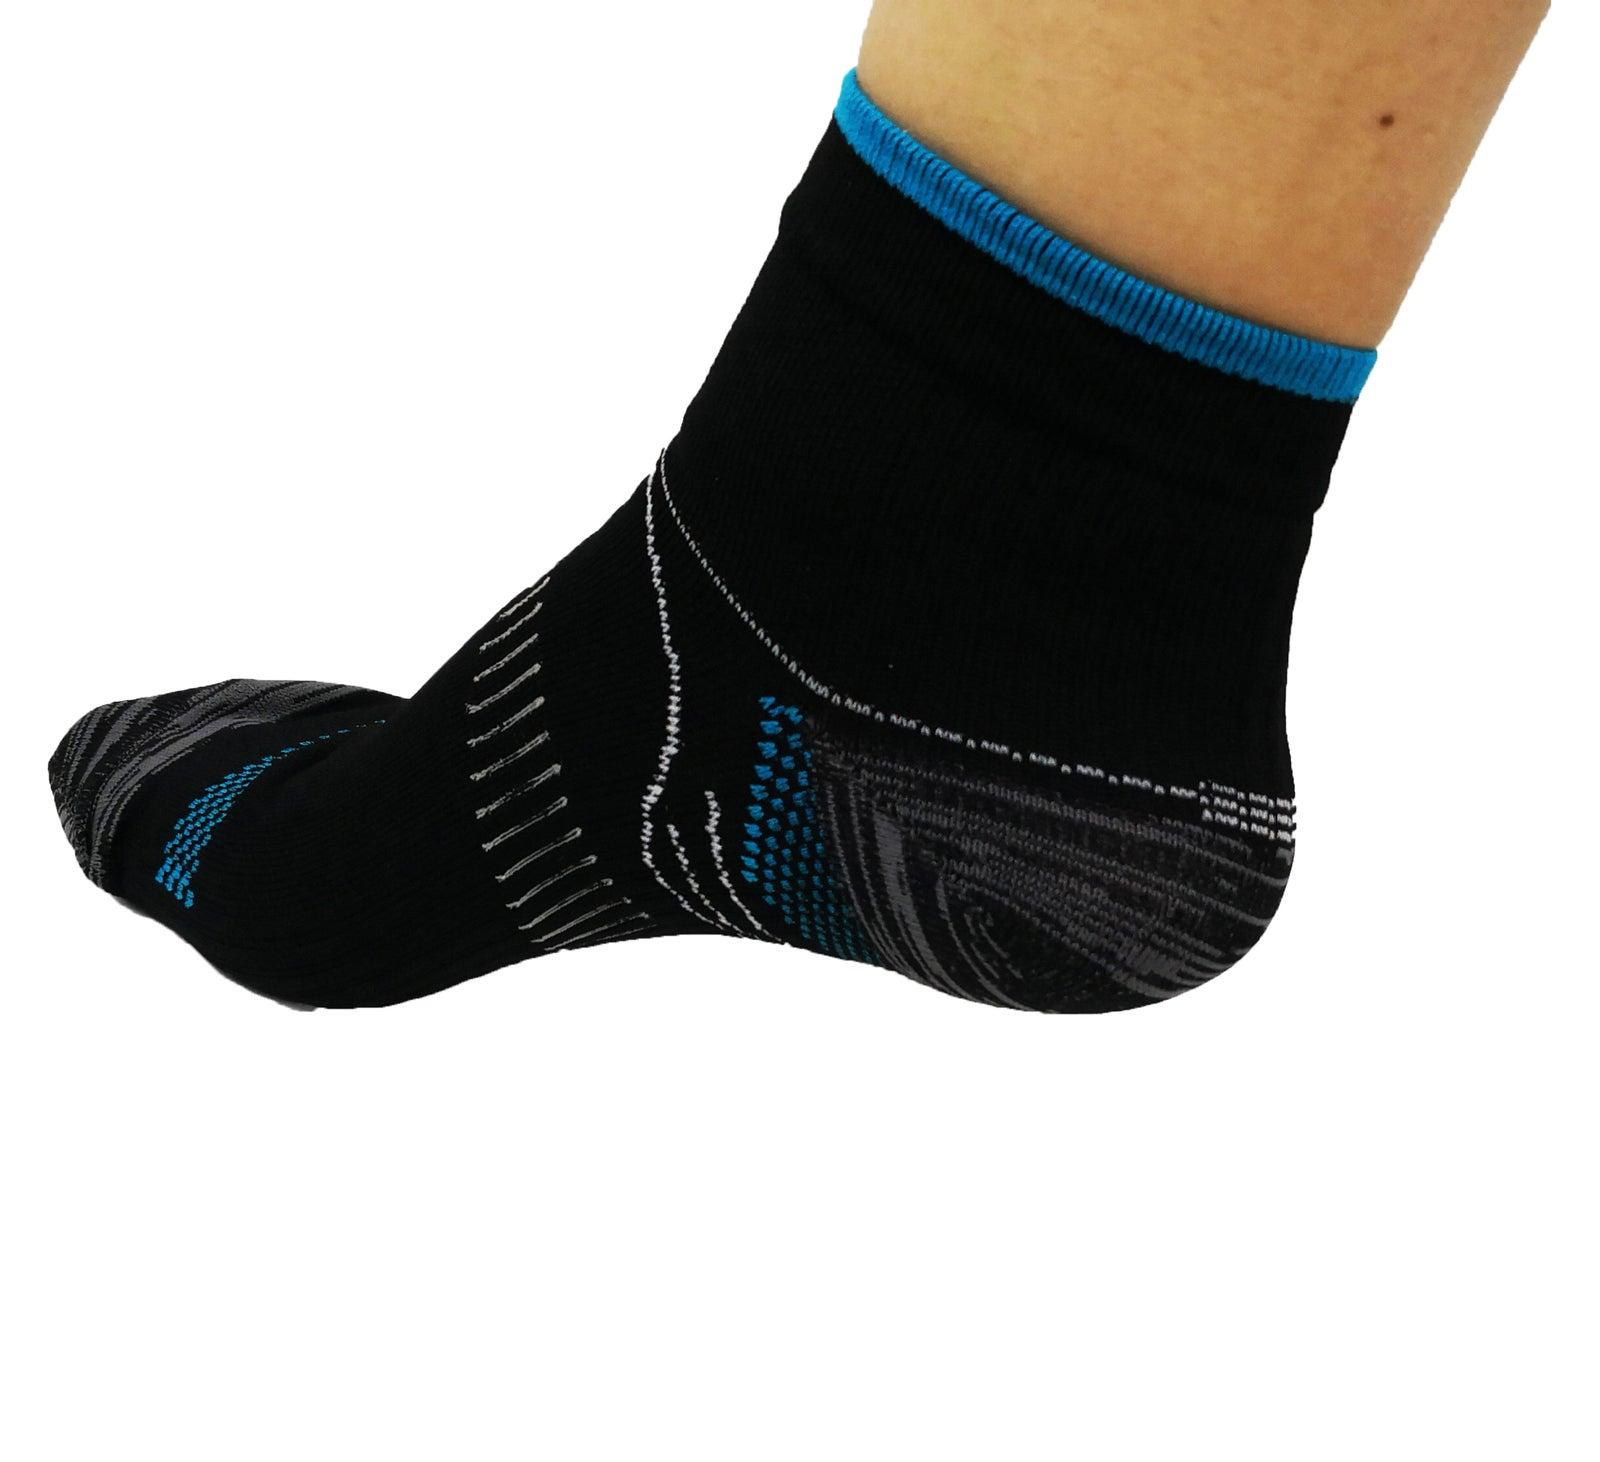 AXIGN Medical Compression Running Socks - Blue/Black